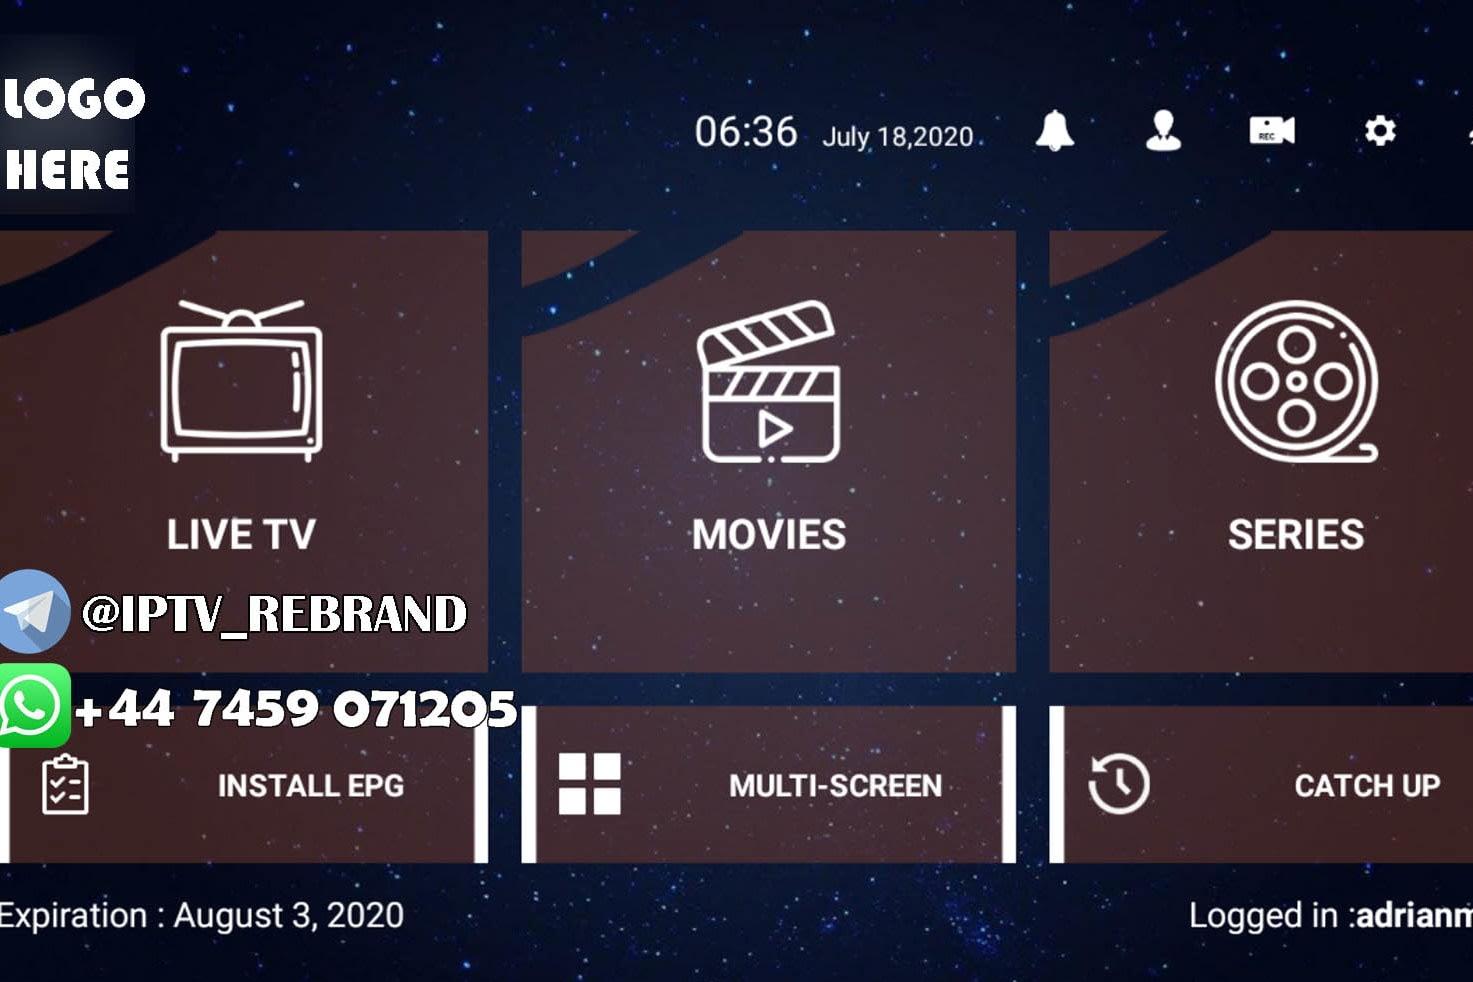 Portfolio for IPTV Rebrand All Applications